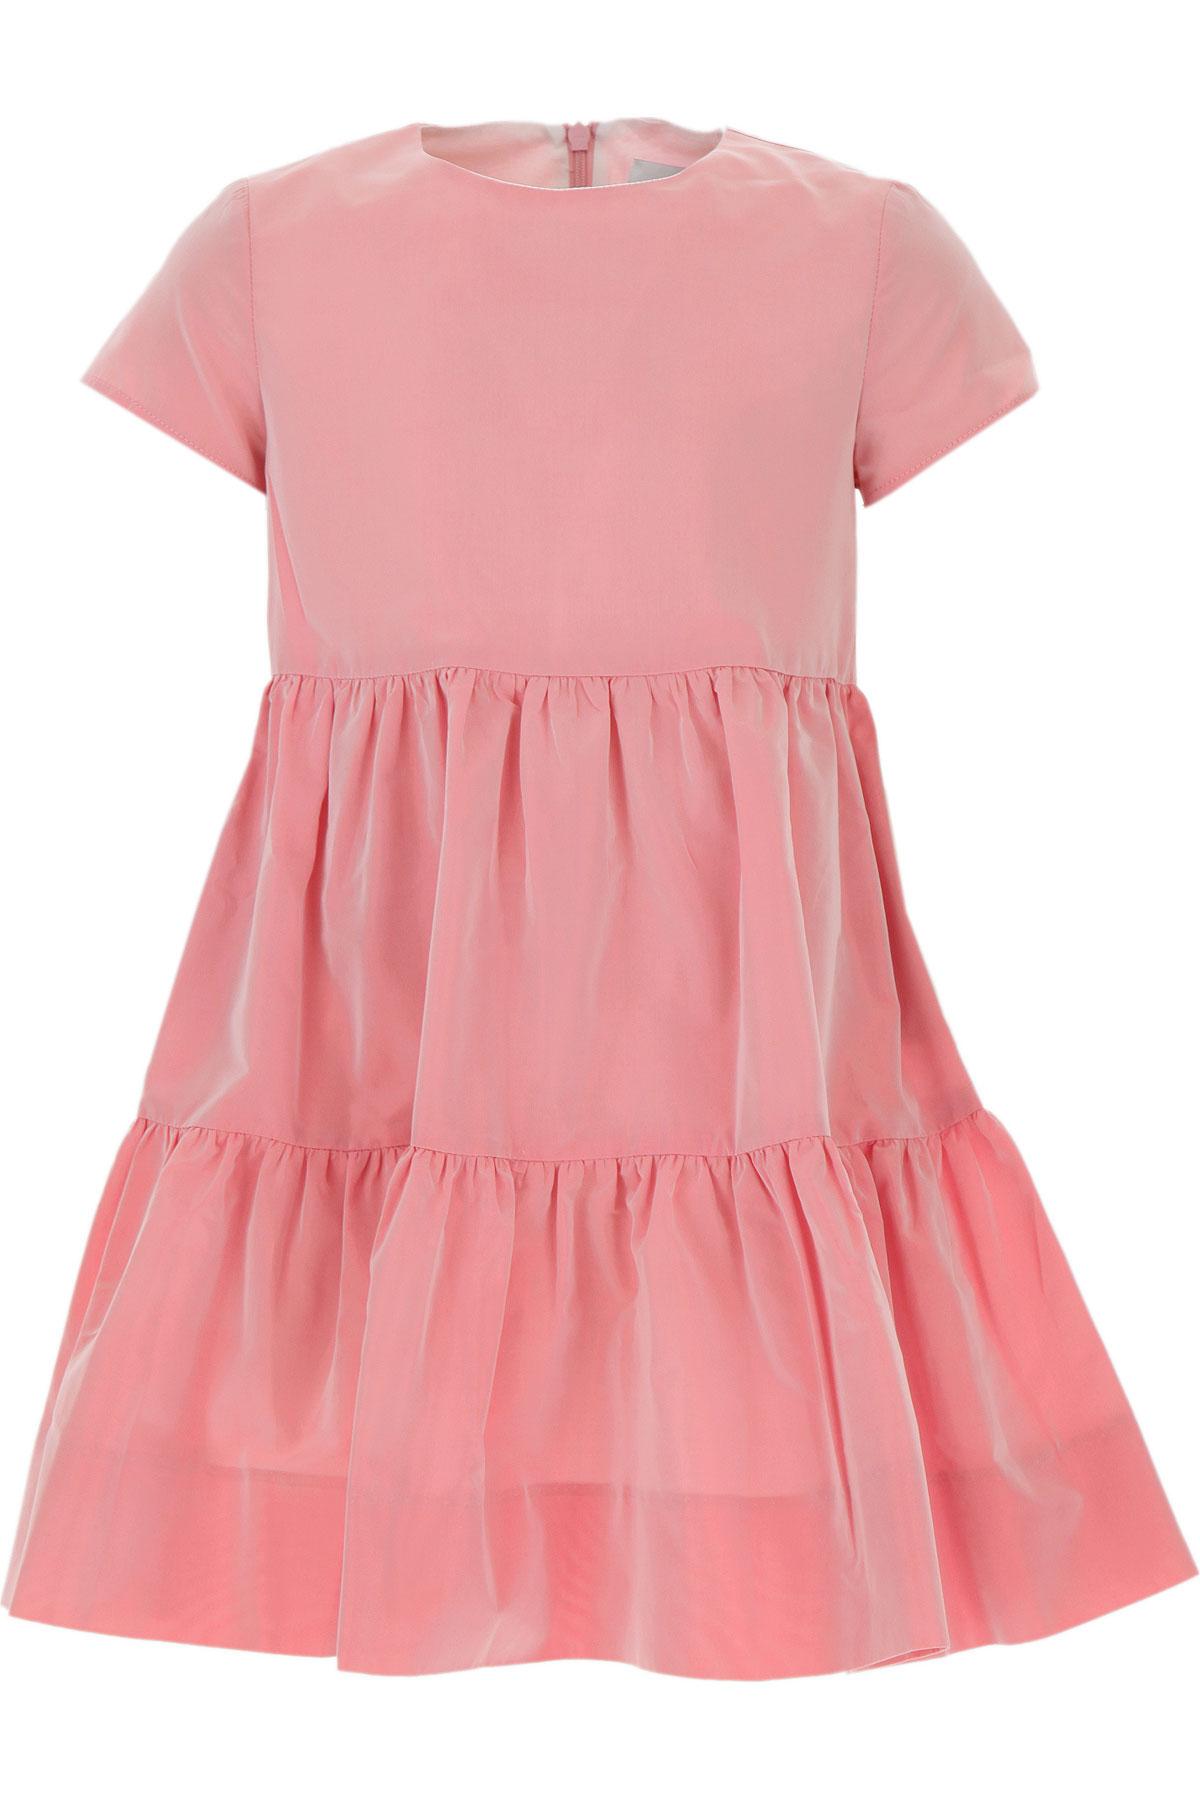 Le Petit Coco Girls Dress On Sale, Pink, acetate, 2019, 10Y 3Y 4Y 8Y